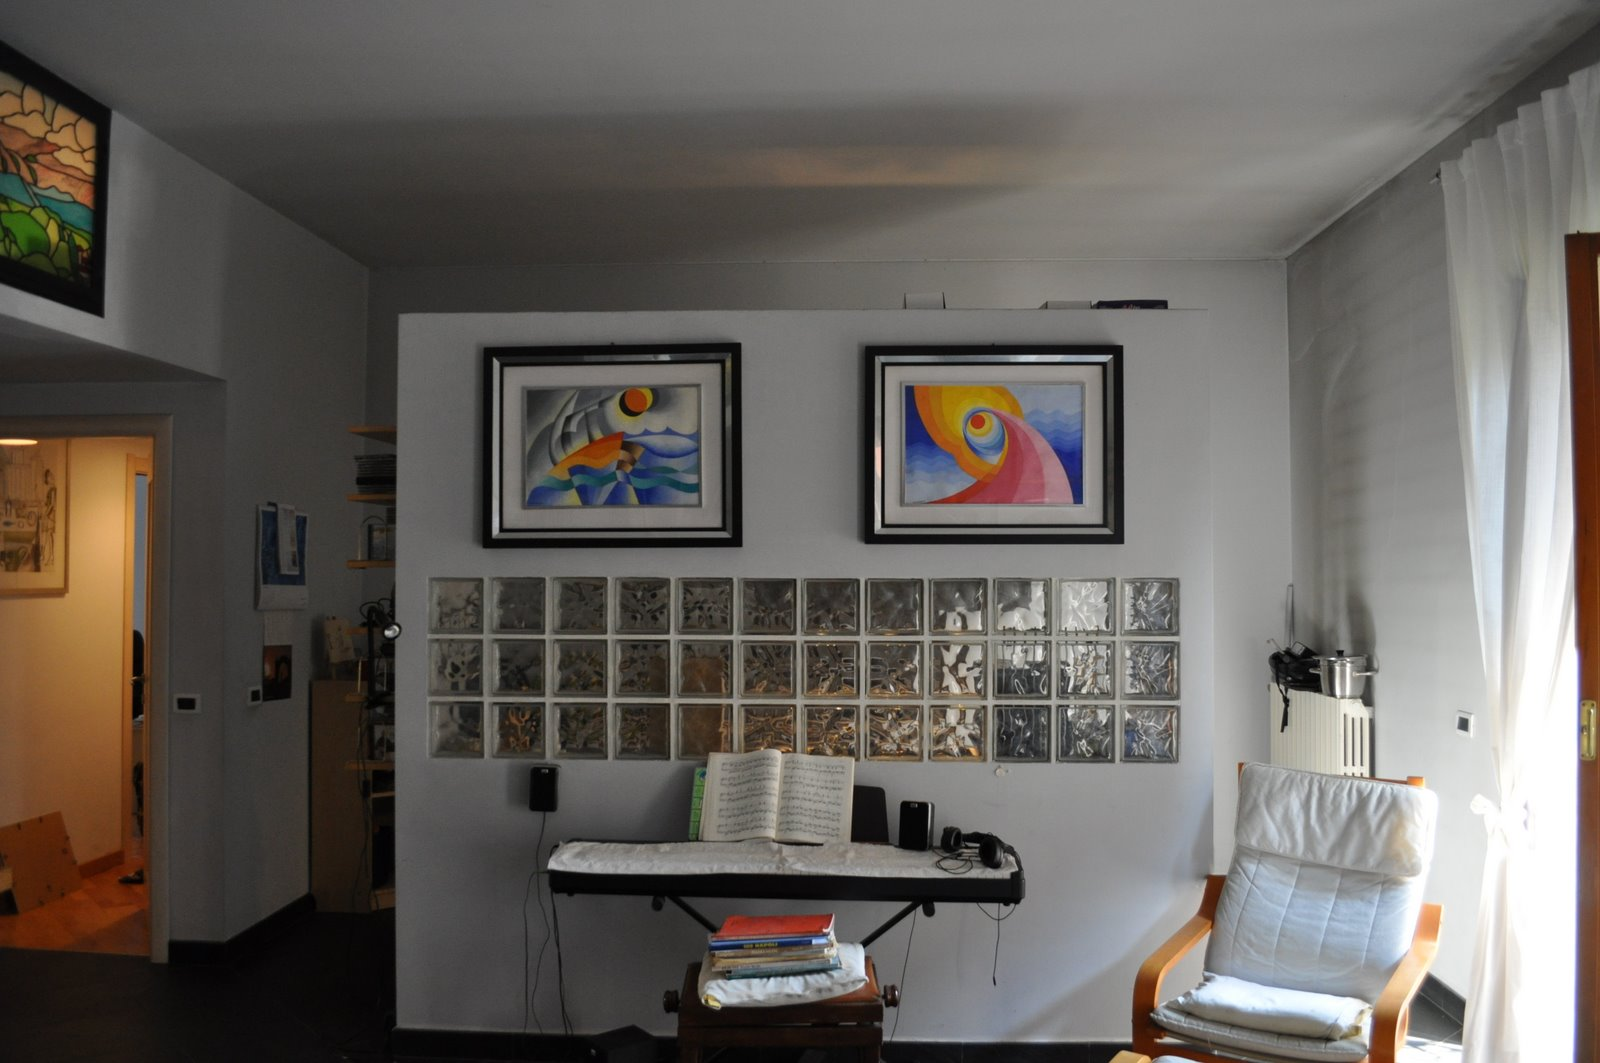 Lampadario sospeso moderno - Salone e cucina open space ...